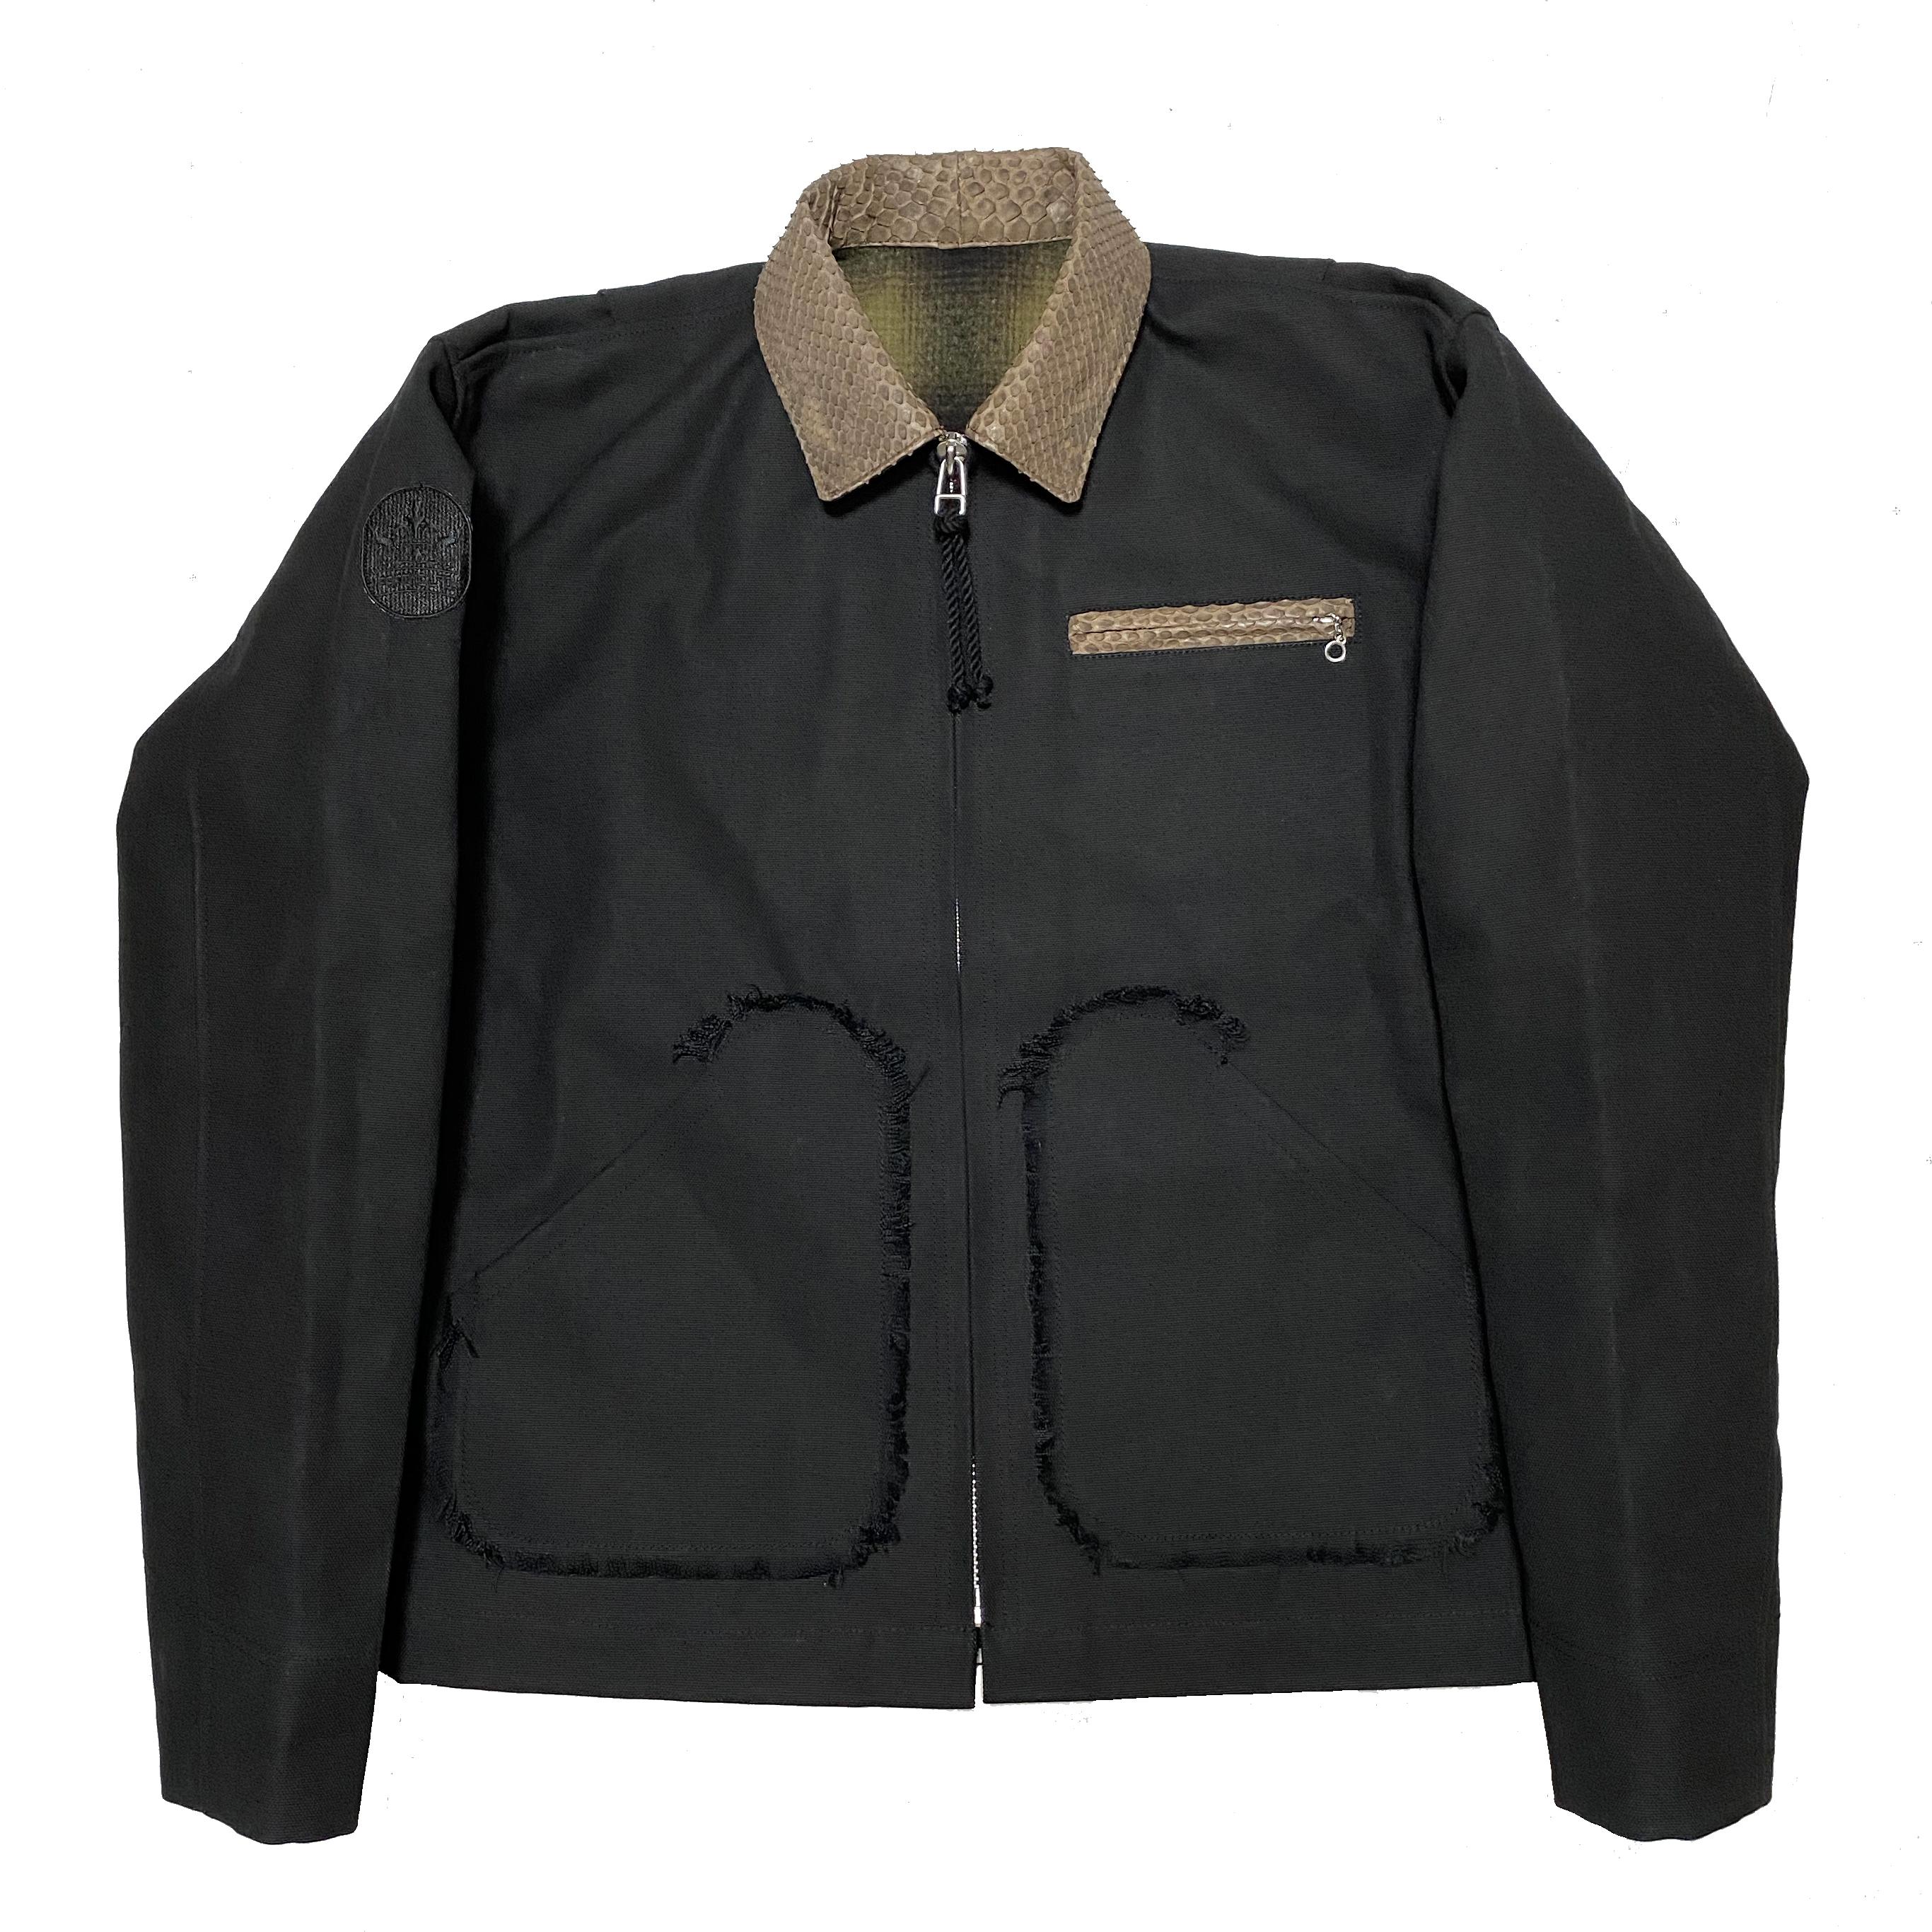 Petroit Work Jacket / Black - 画像1